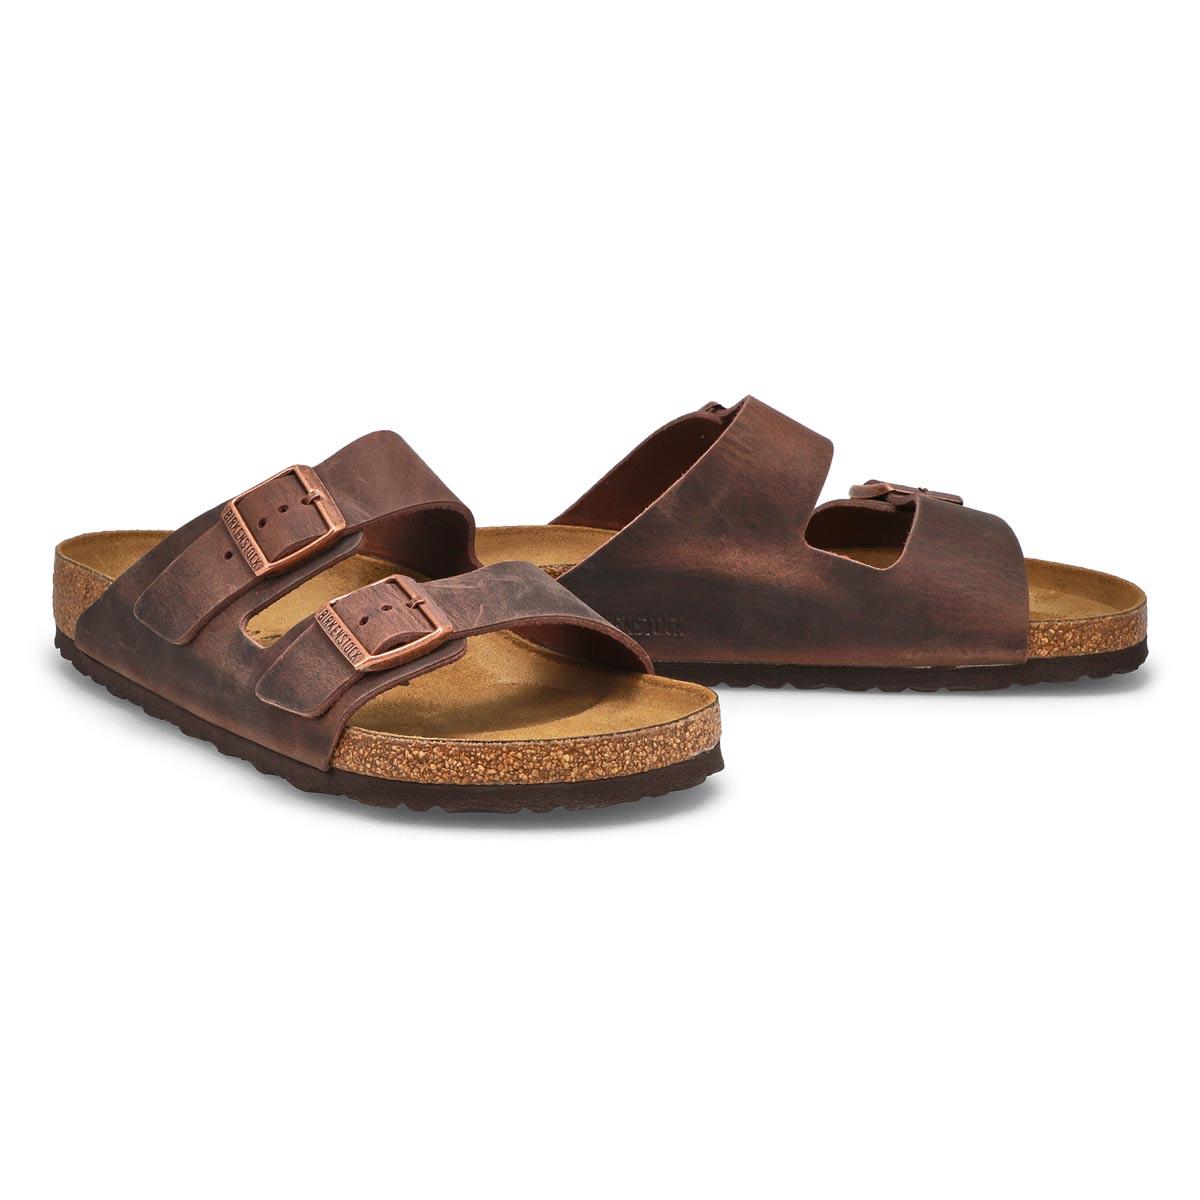 Mns Arizona habana 2 strap sandal